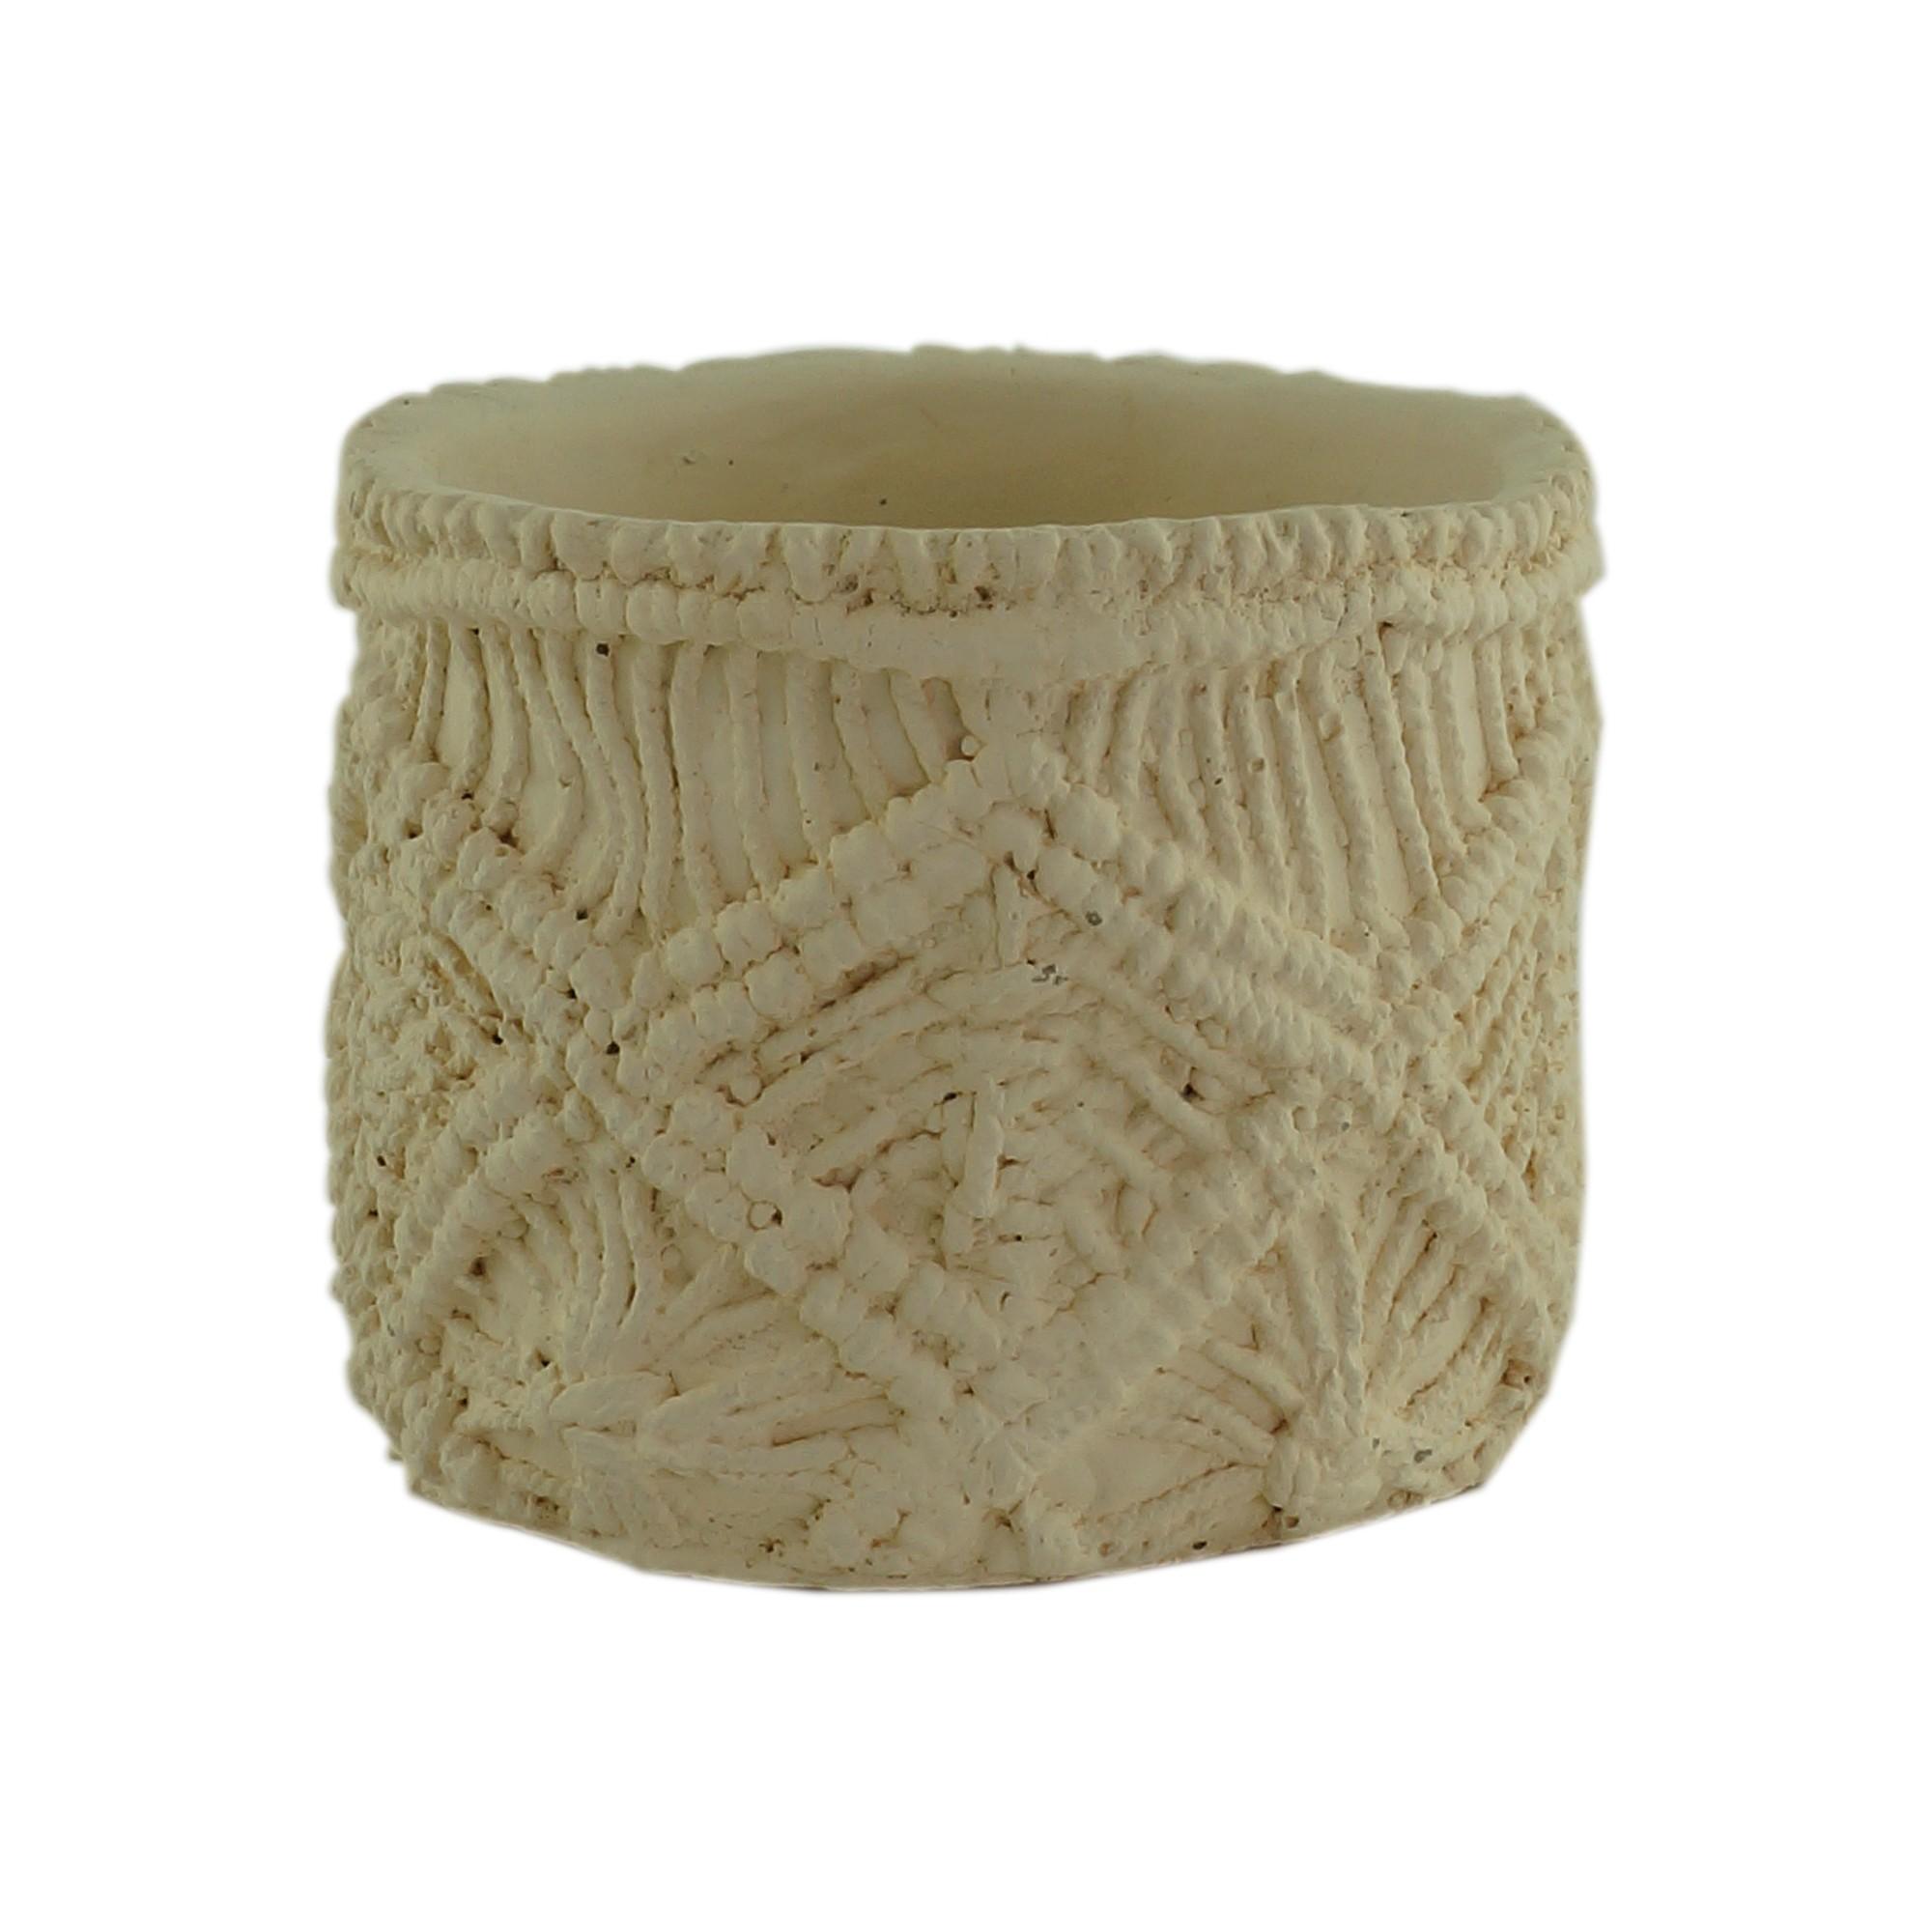 Vaso Decorativo de Concreto Redondo 10 cm - Urban